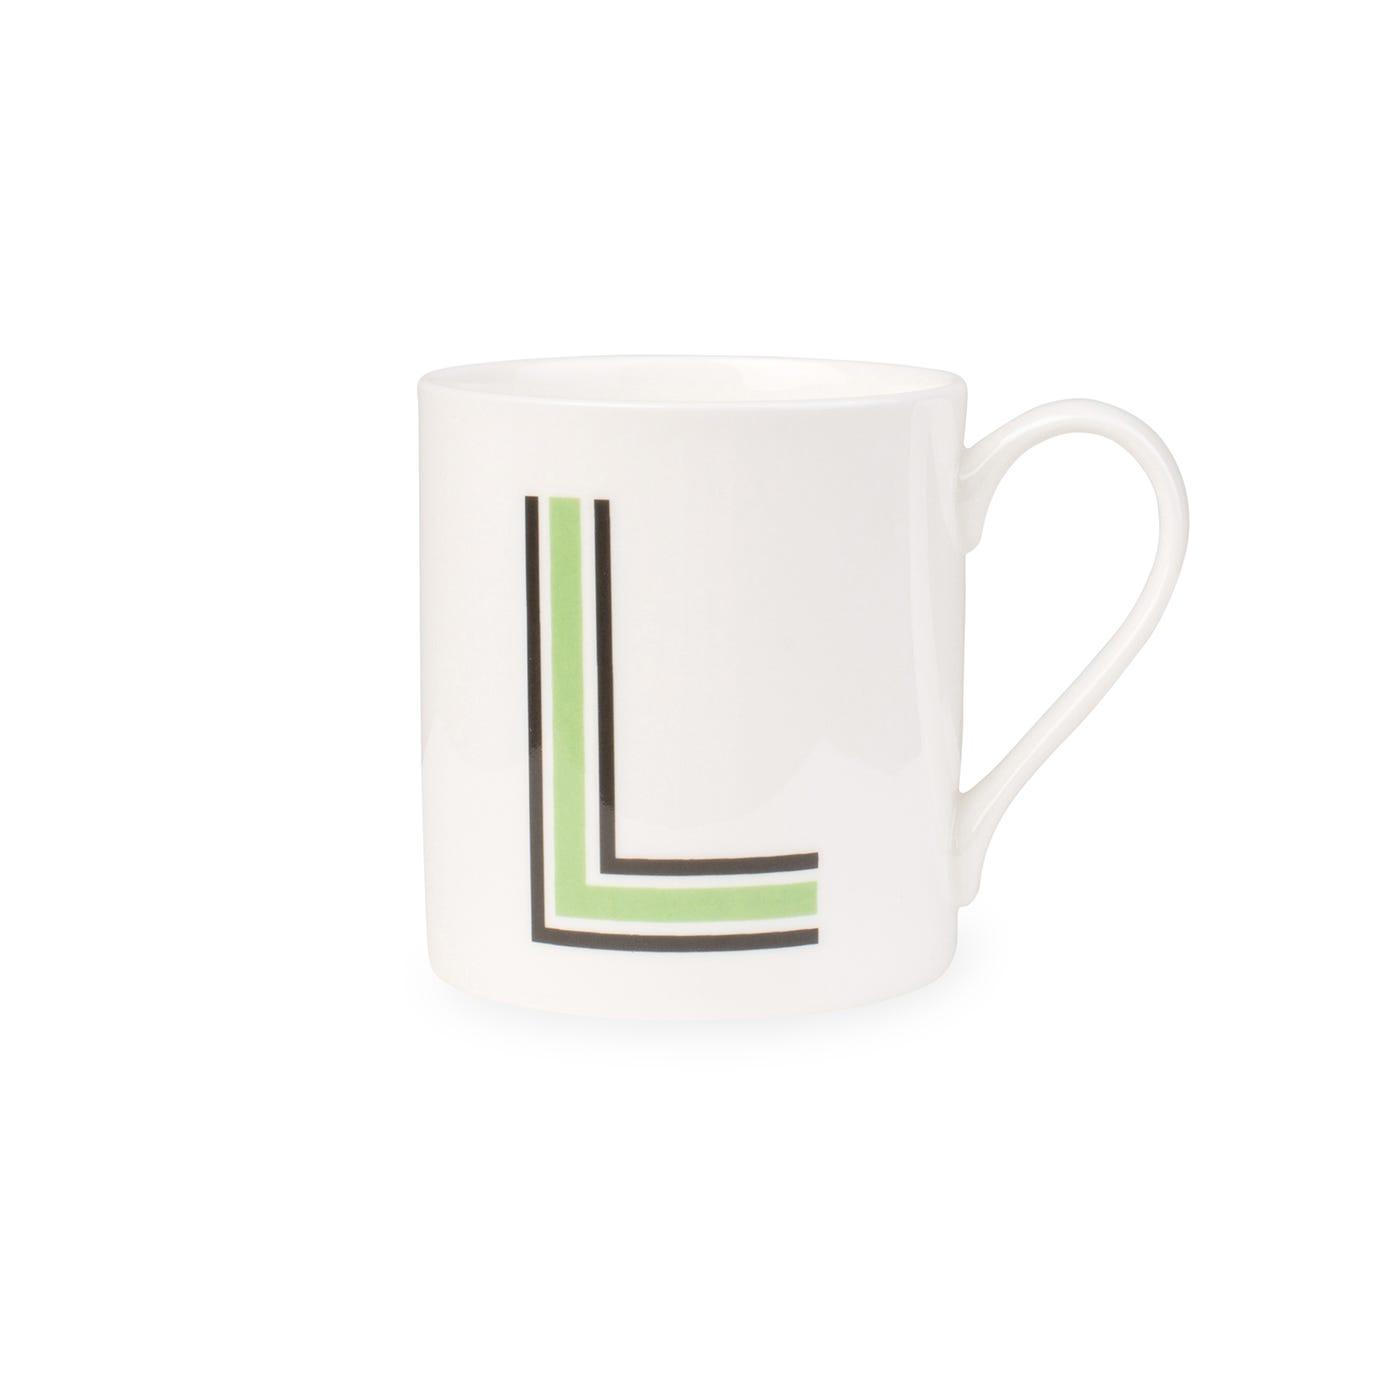 Heal's Heal's Heritage Alphabet Mug L